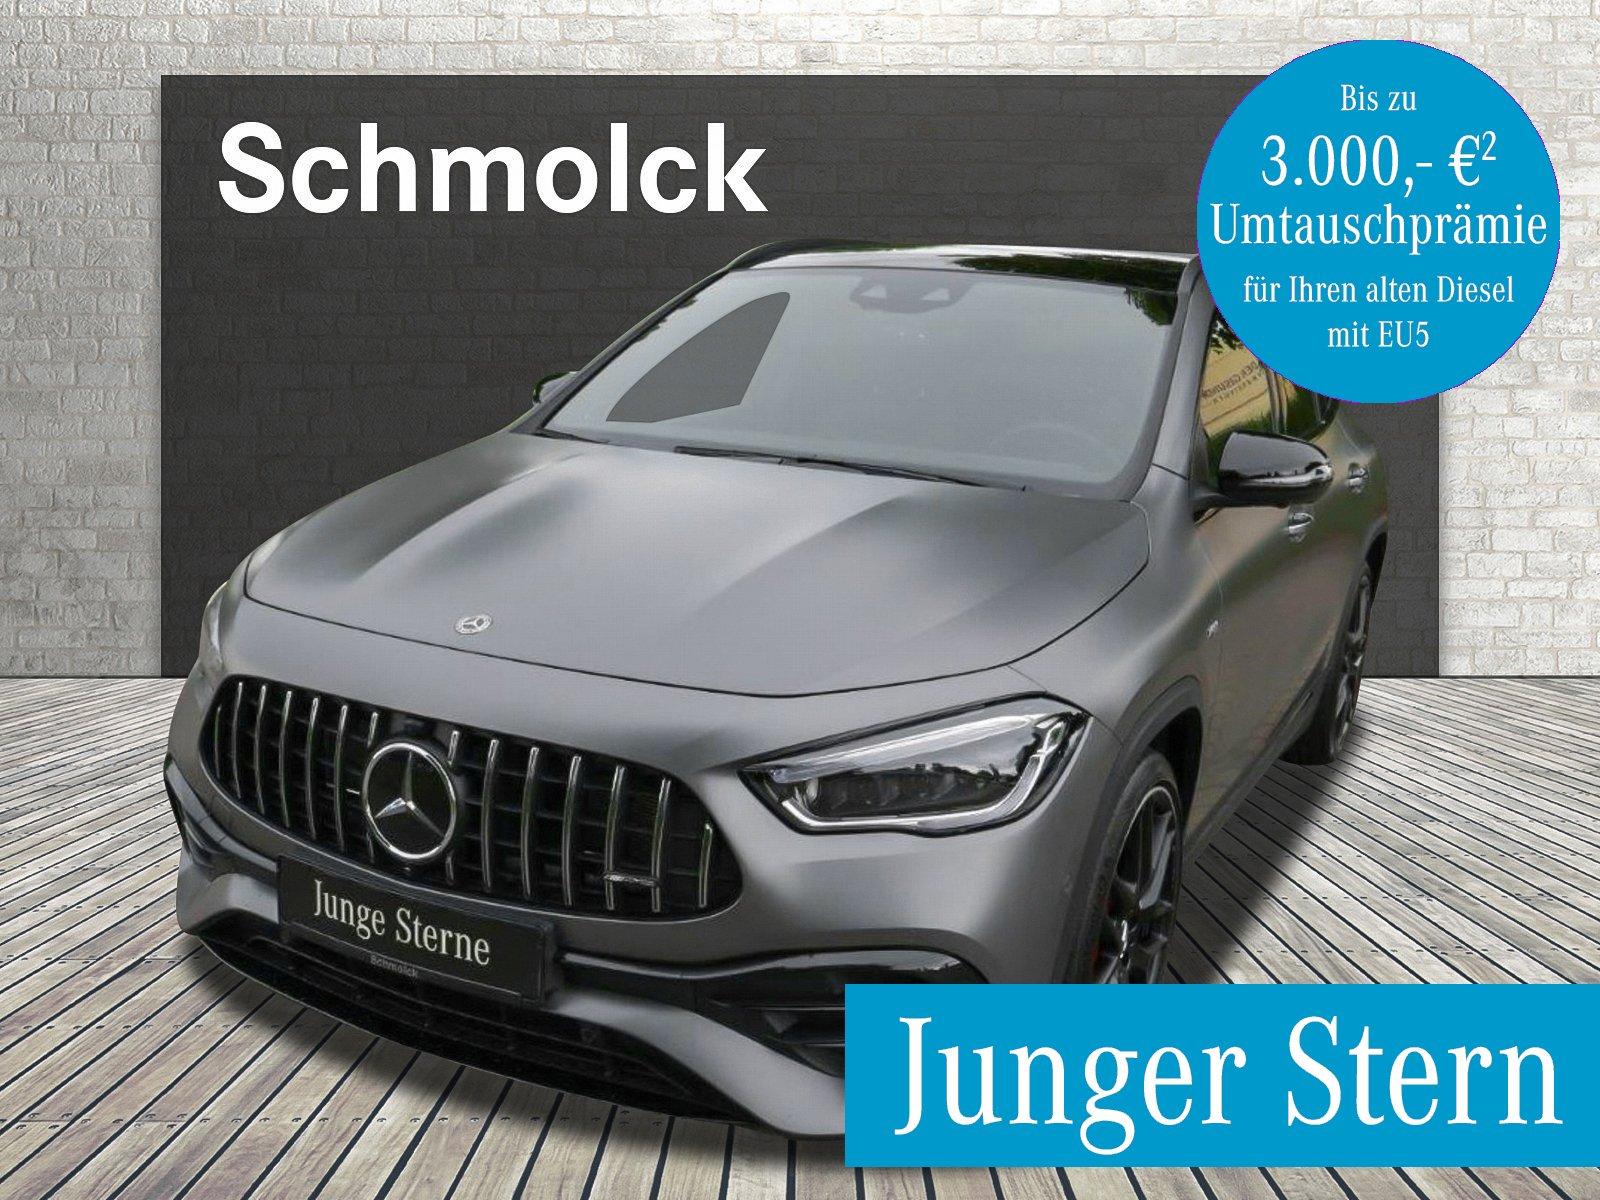 Mercedes-Benz GLA 45 AMG S 4M+ DSTR/PANO/DRIVER`S P/BURM +86K*, Jahr 2020, Benzin